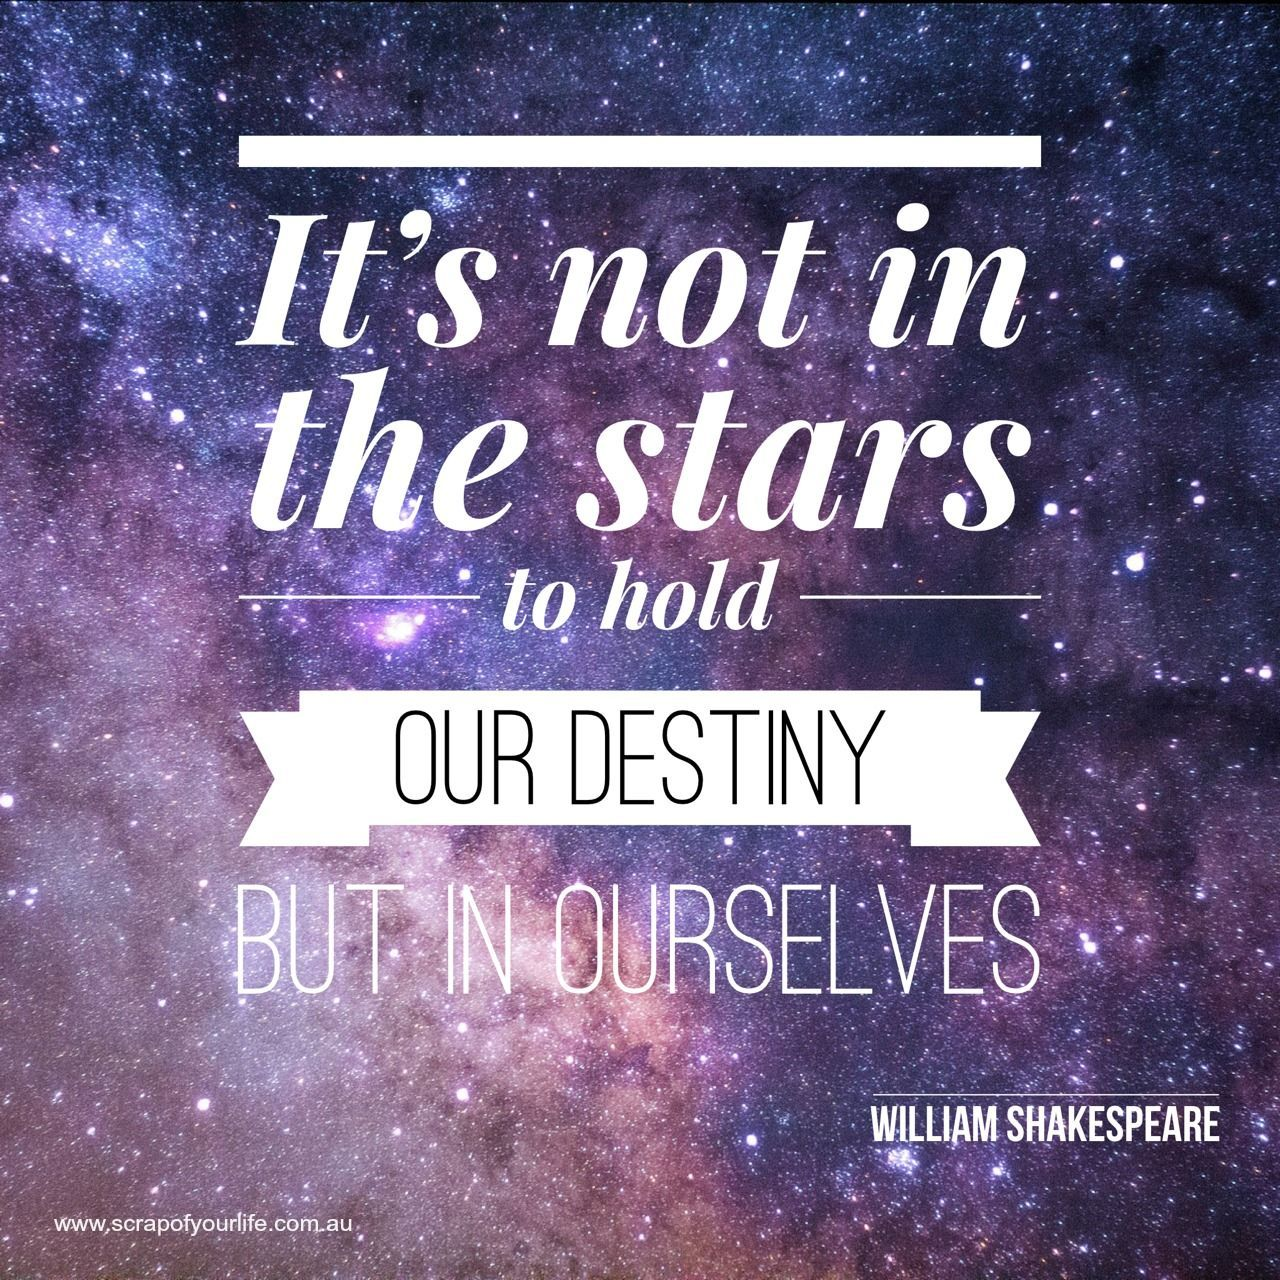 scrap of your life creative quotes  creativity quotes